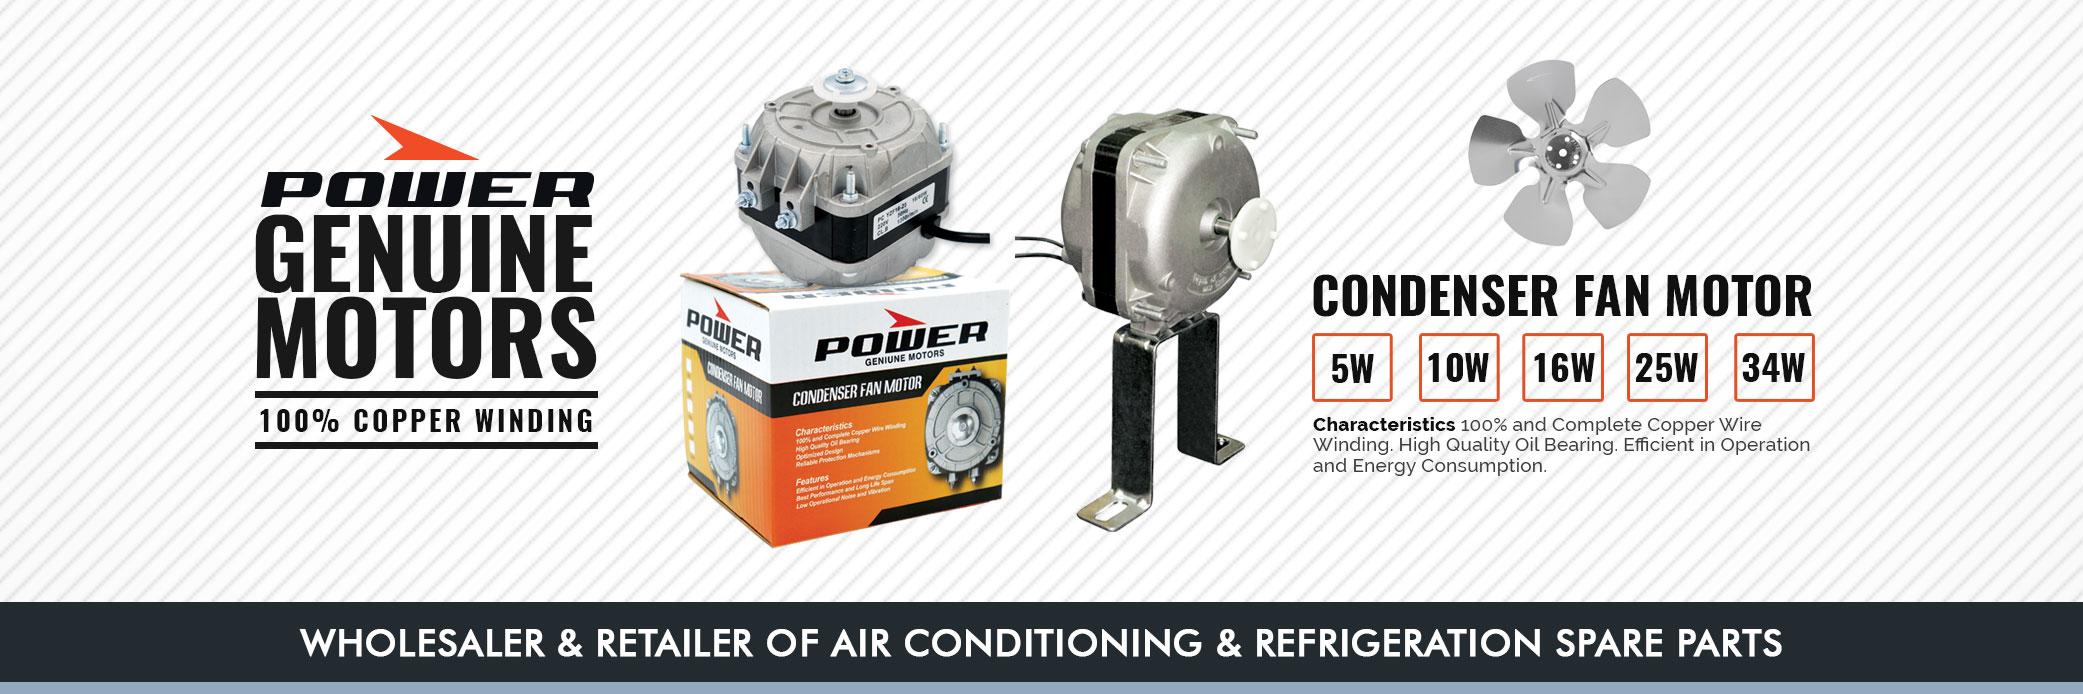 Power Condenser Motor in Oman